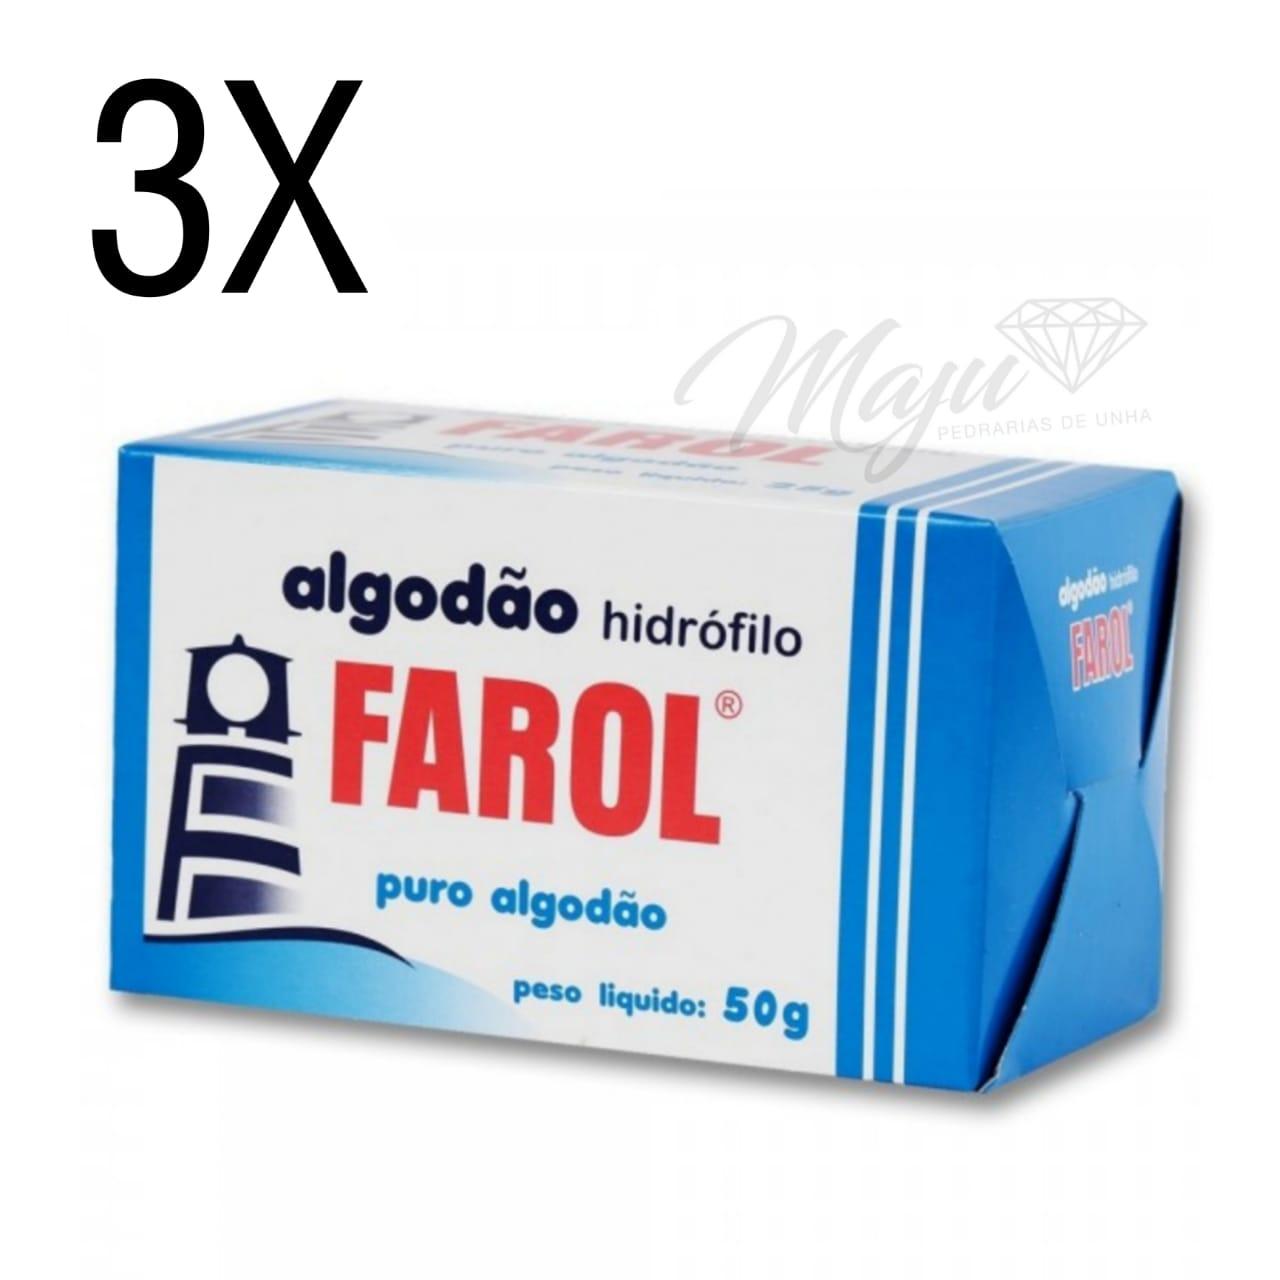 KIT ALGODAO CAIXA DE 50G HIDROFILO 3 UND FAROL